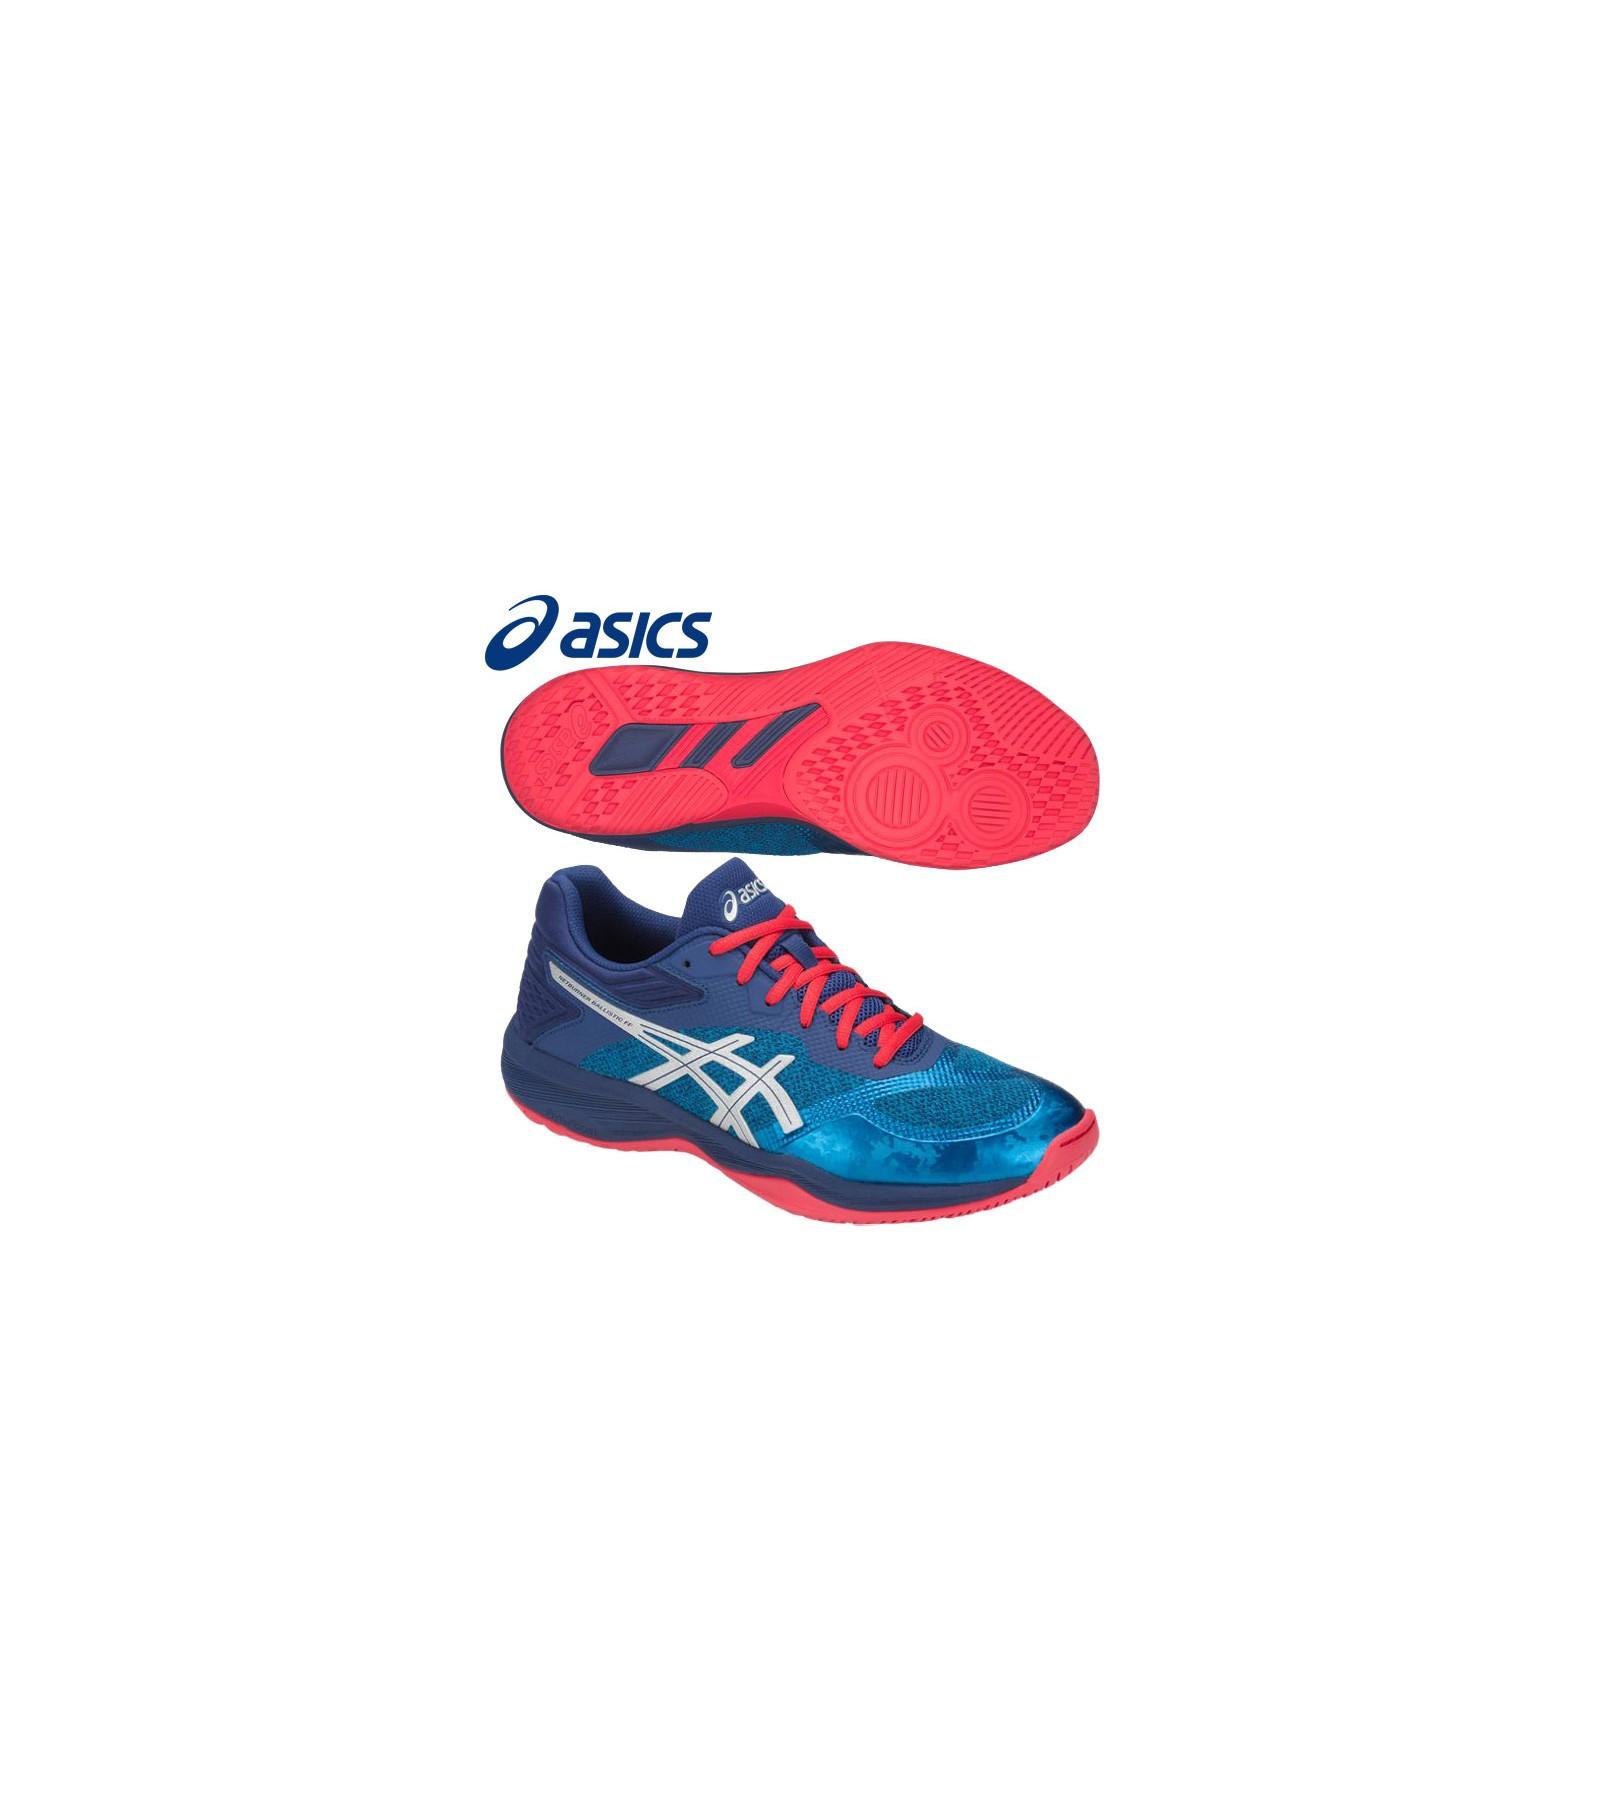 Asics Gel Netburner FF Ballistic Blu Bianco Rosso Sporting Lab